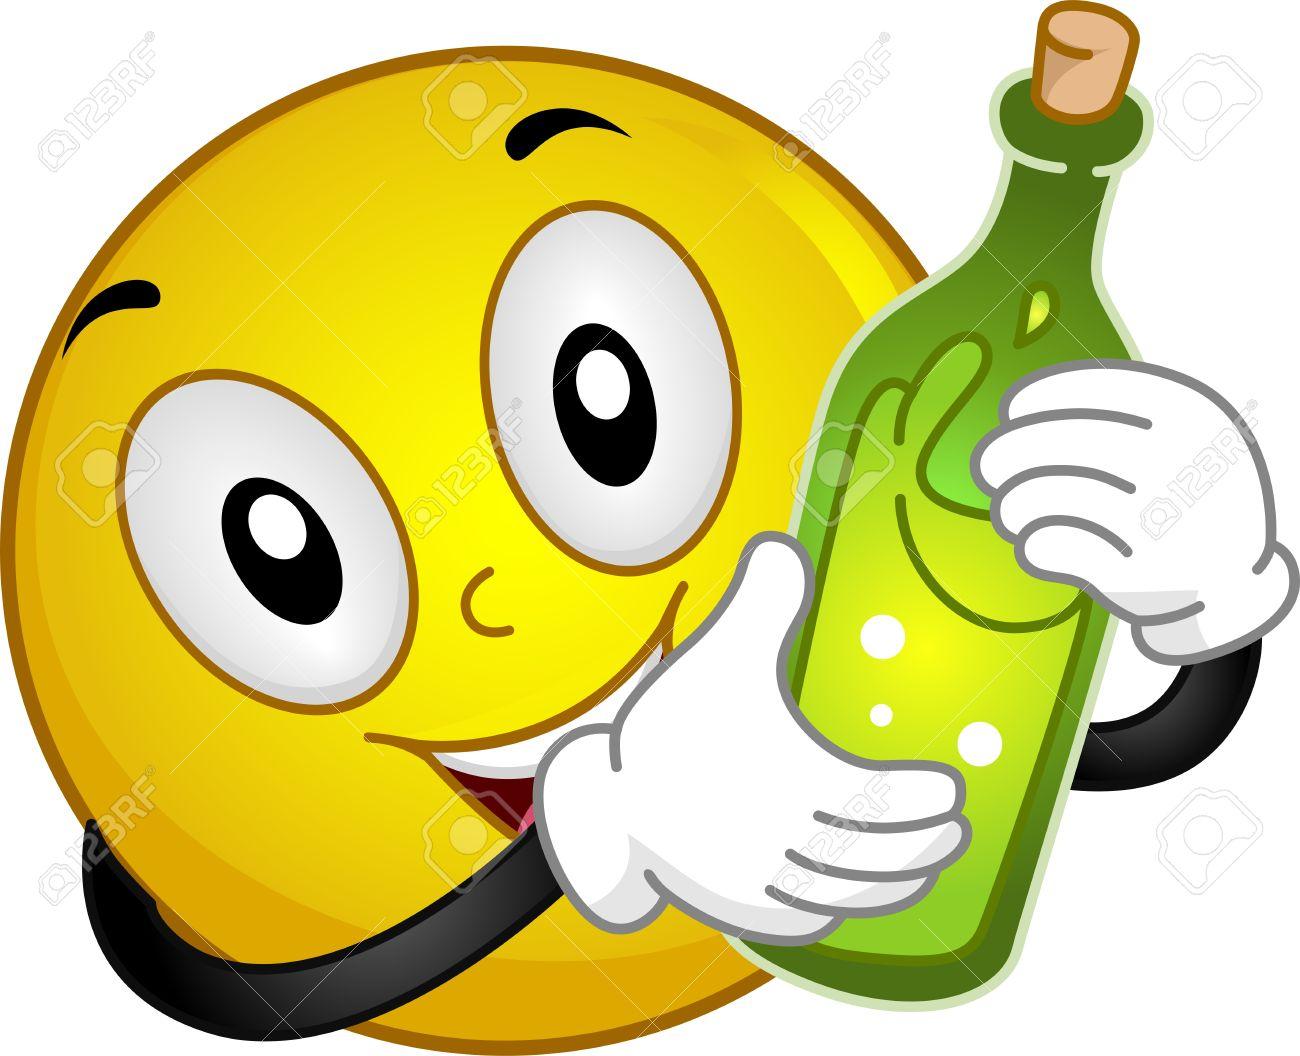 alcohol smiley Illustration Drunk Emoticon